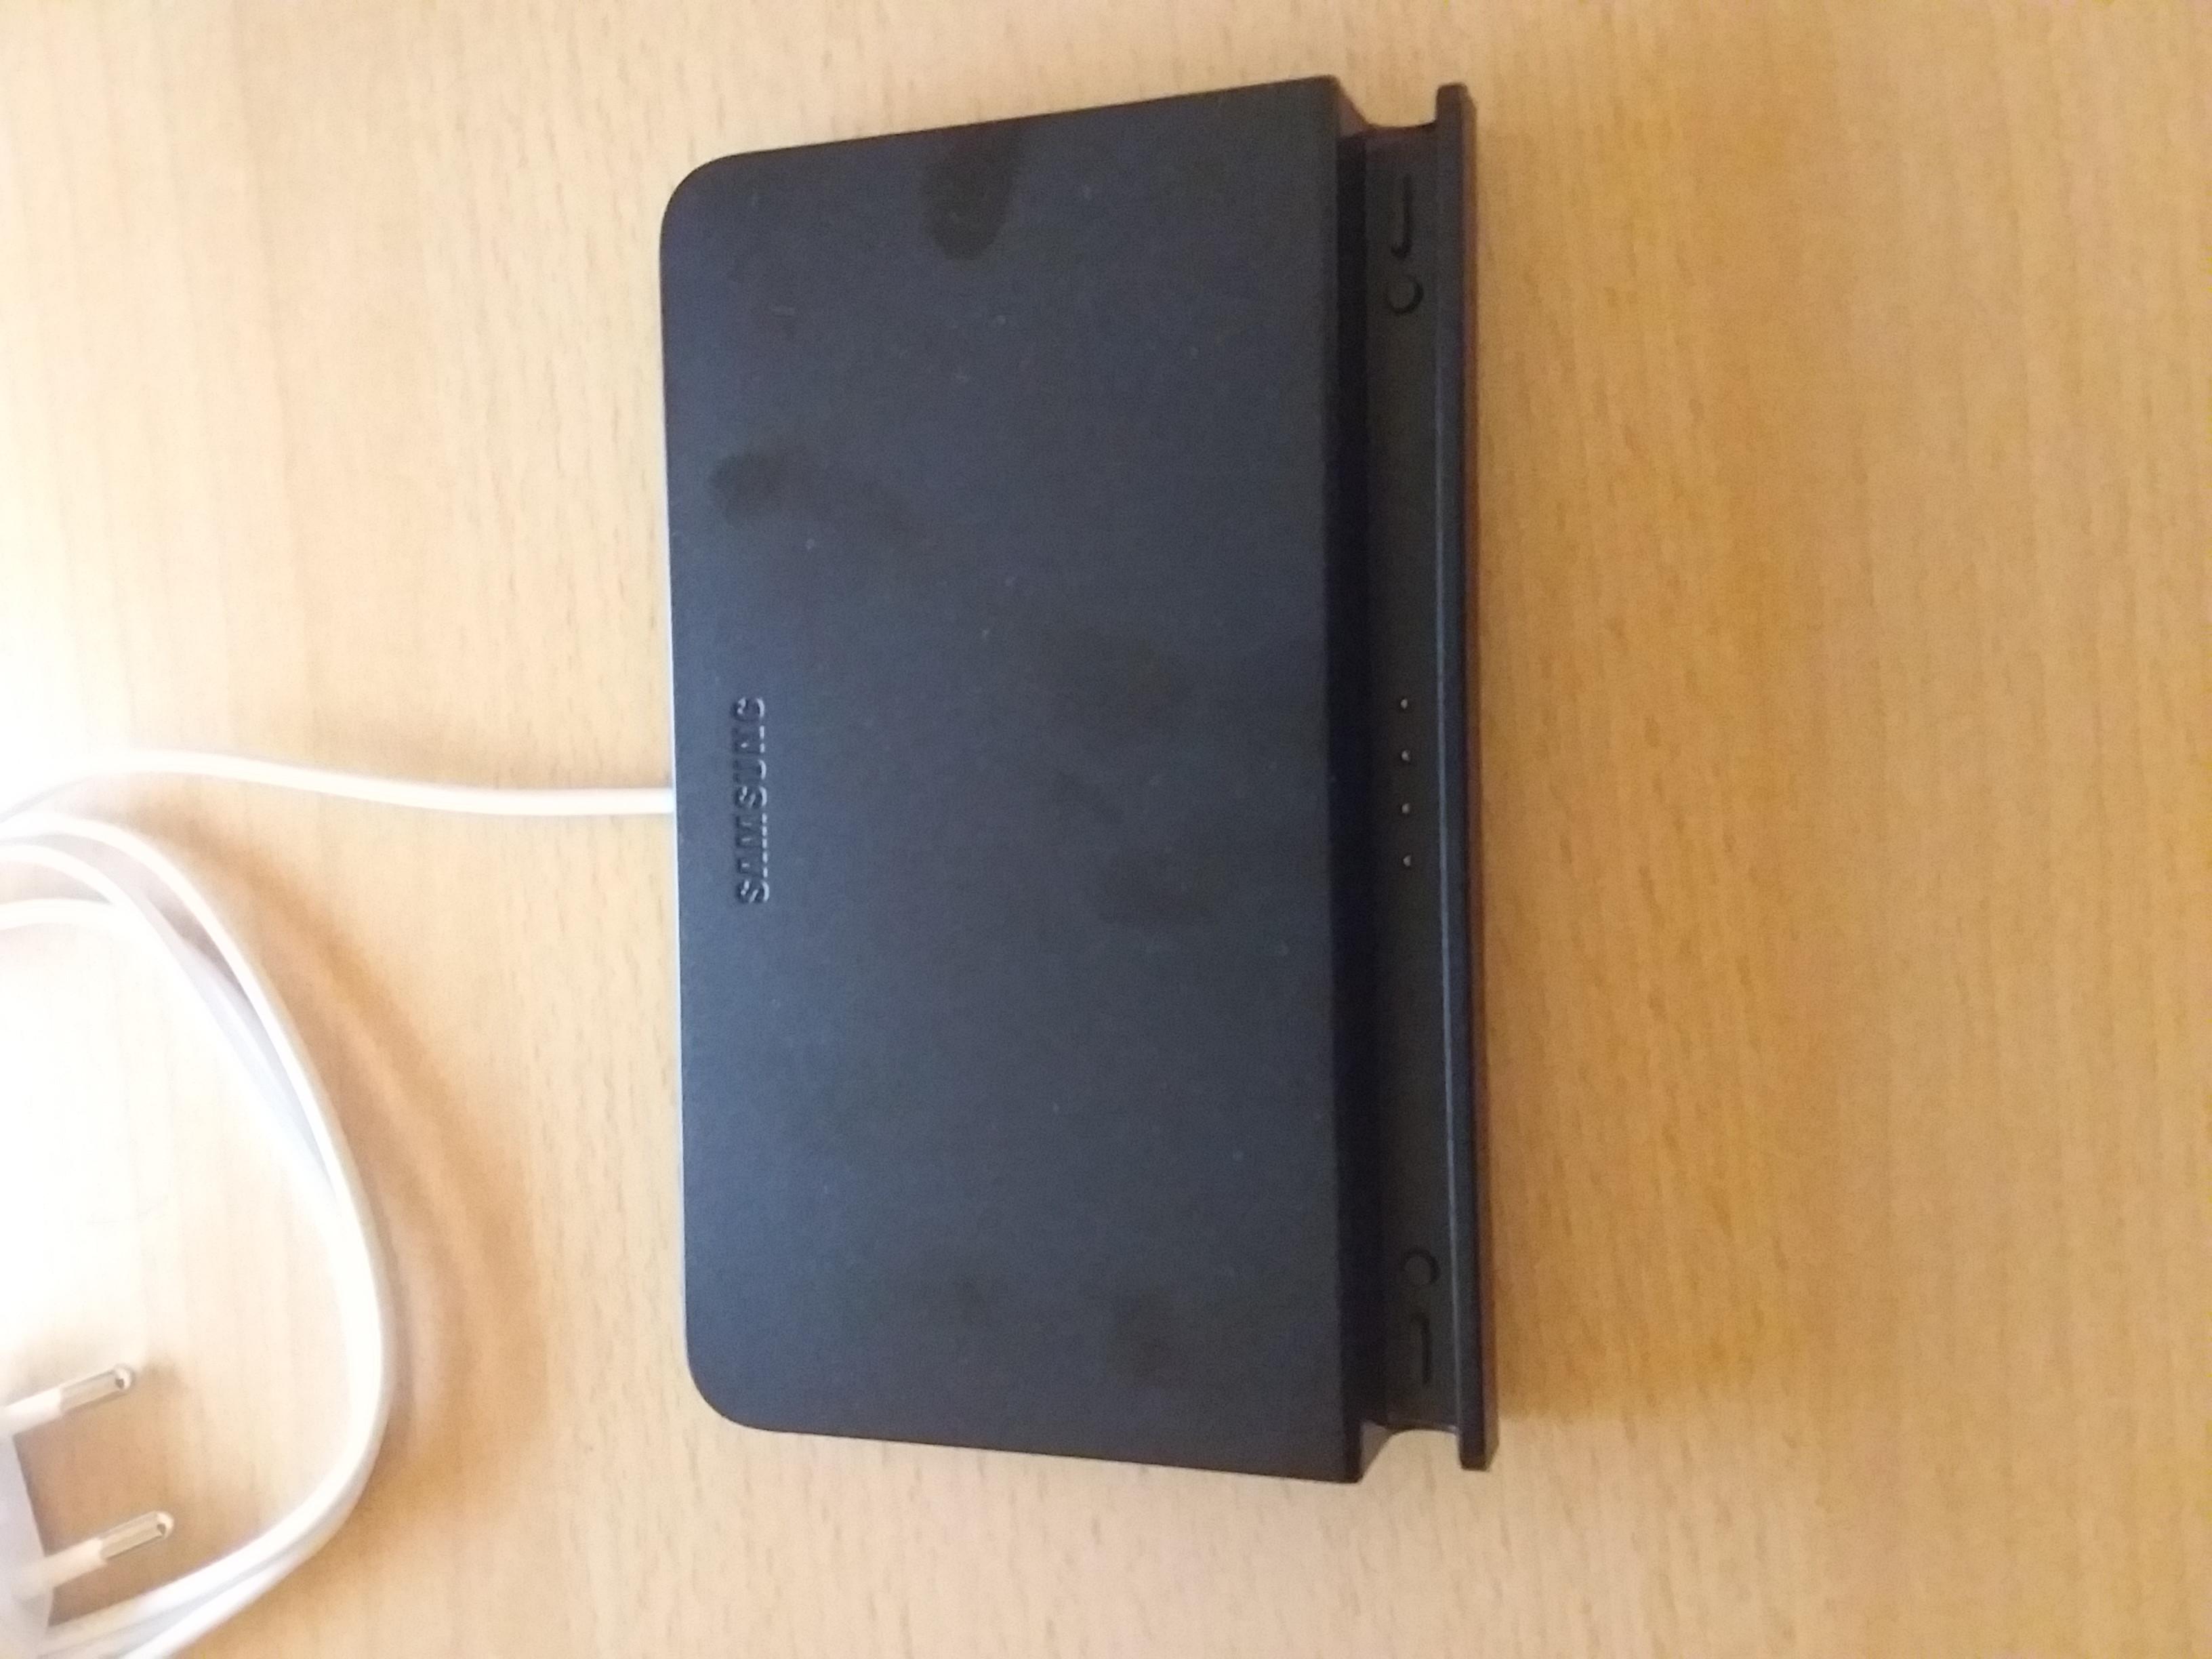 Samsung Charging Dock Pogo Tab S4 & Tab A 10.5